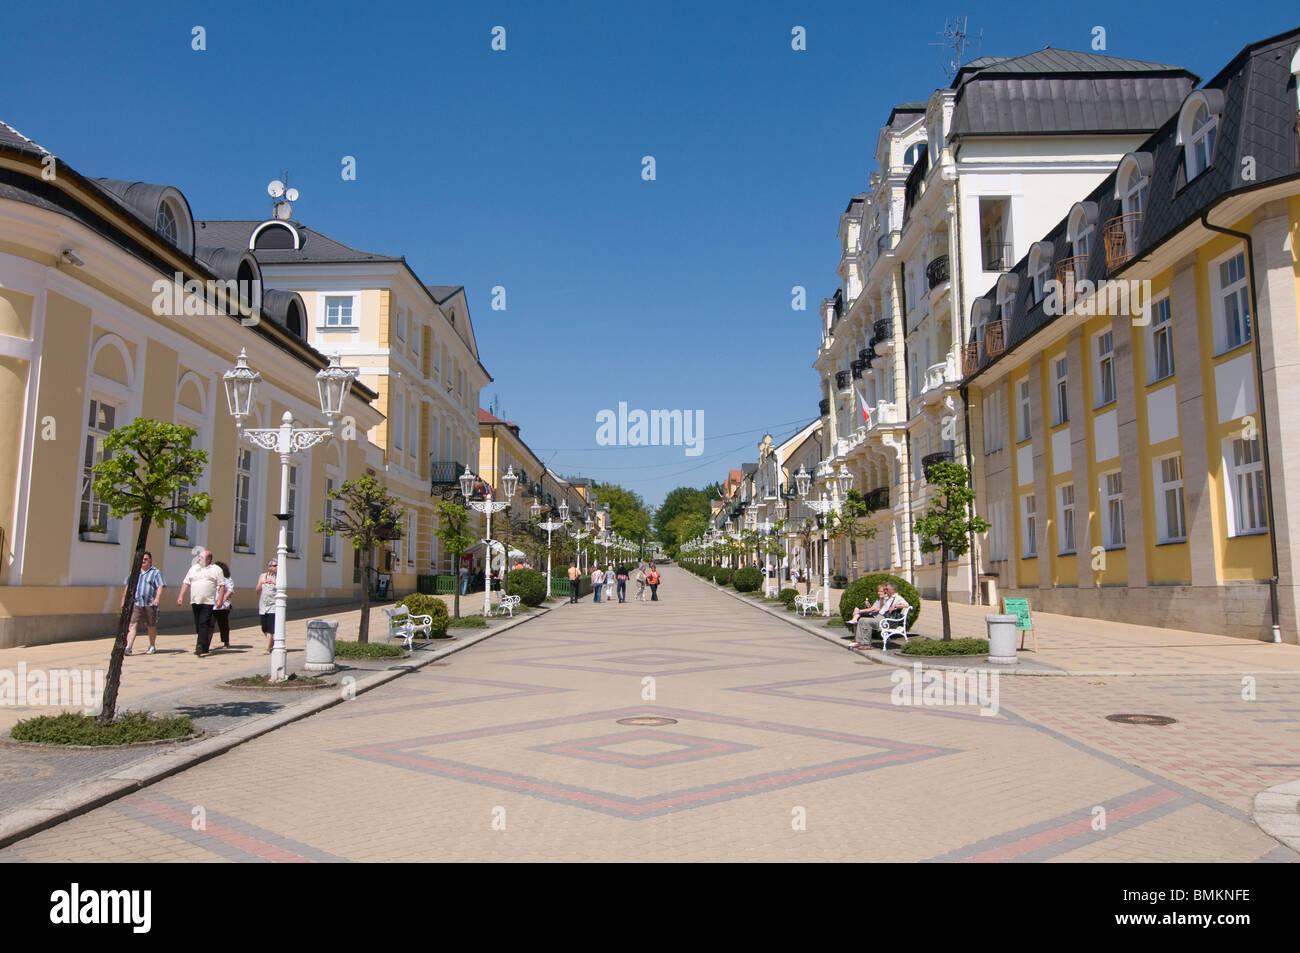 Pedestrian Area in inner city, Franzensbad,Czech Republic - Stock Image